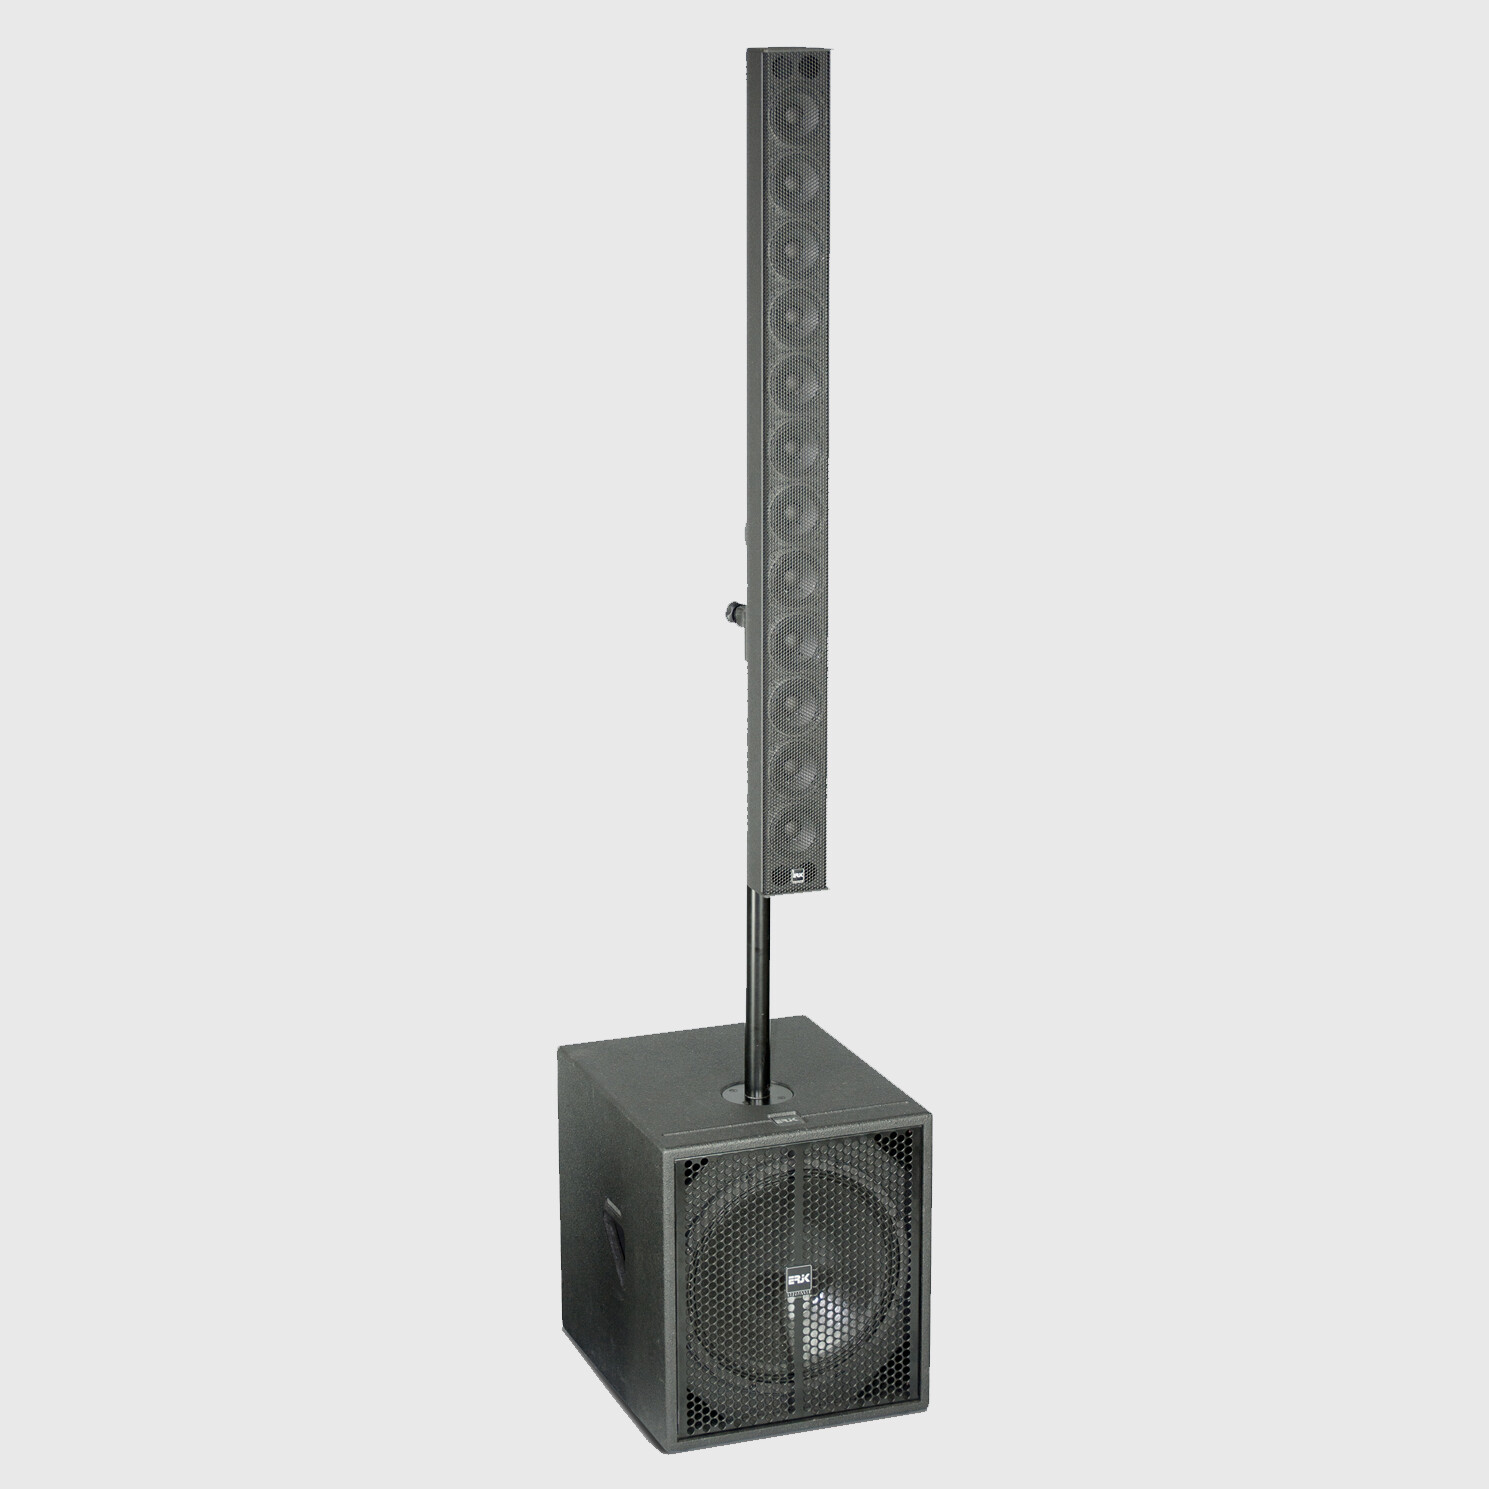 ERJK K4 m KIT, Loudspeakers system with 2 modules